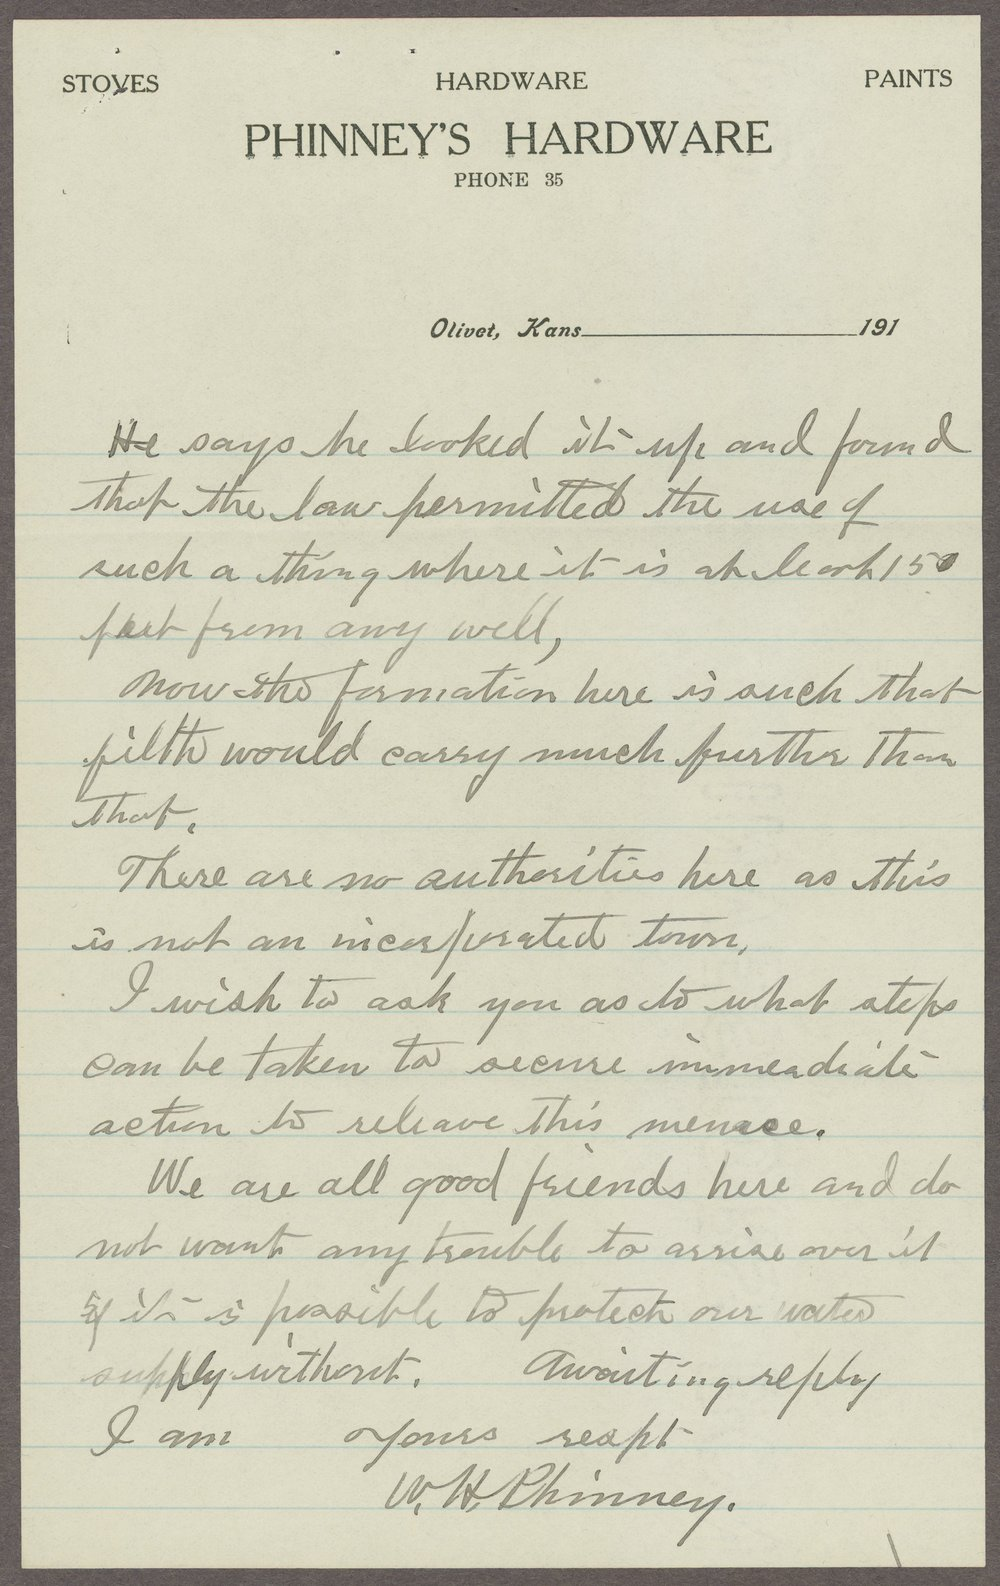 William H. Phinney to Samuel J. Crumbine - 4